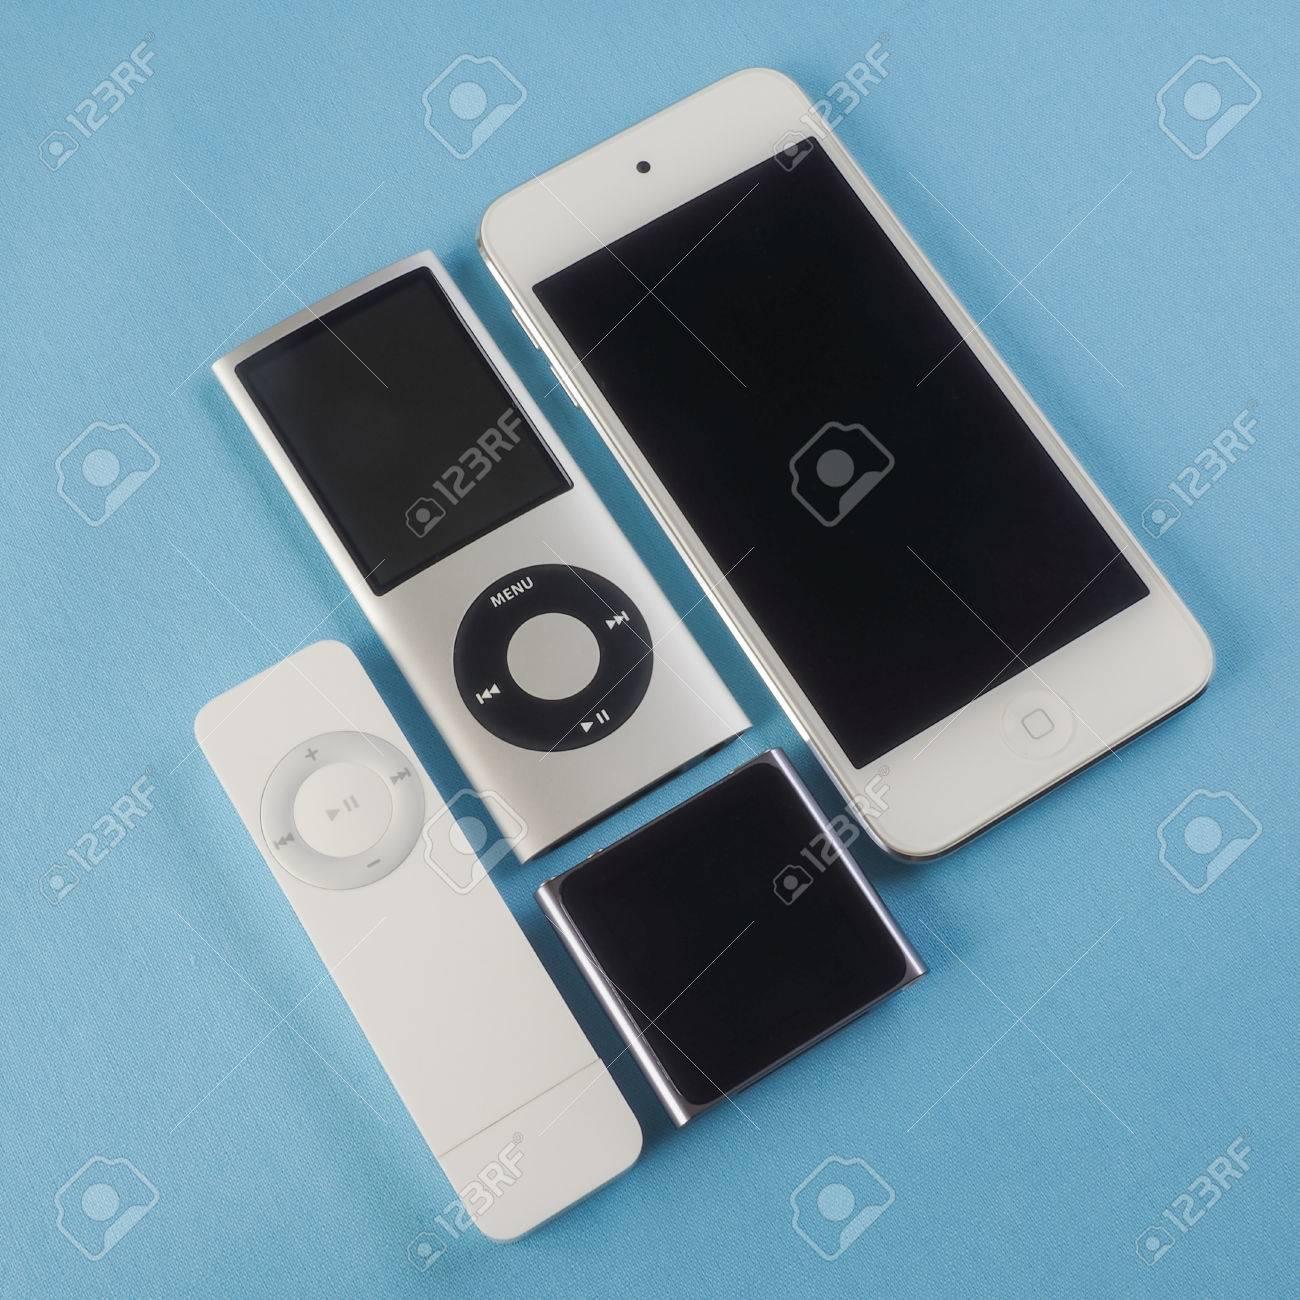 Berry, Australia - June 20 2016 : A group of Apple iPods - iPod Nano